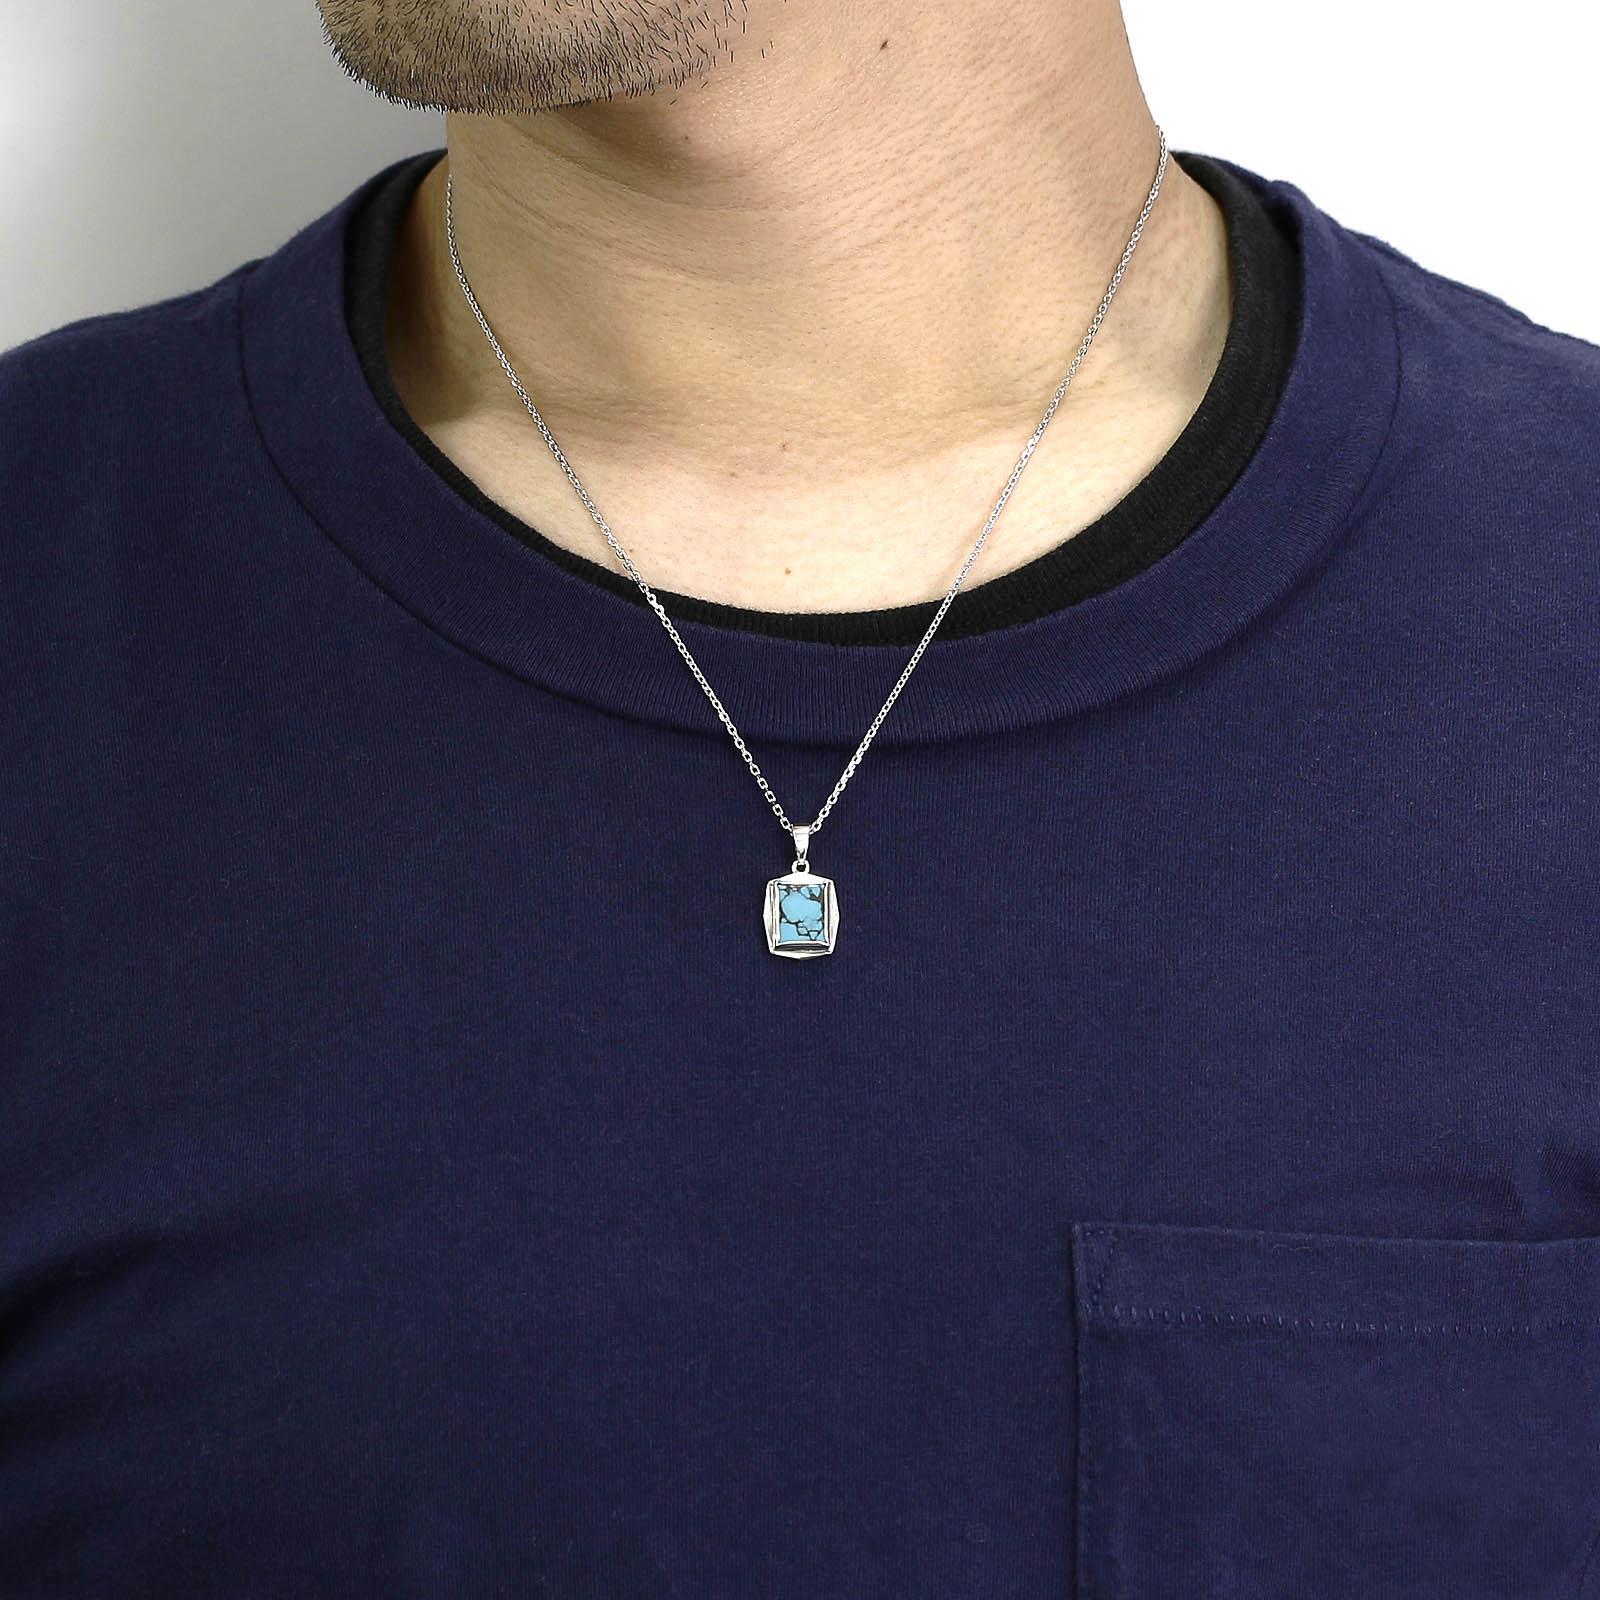 Silver Square Cable Chain 1.6mm